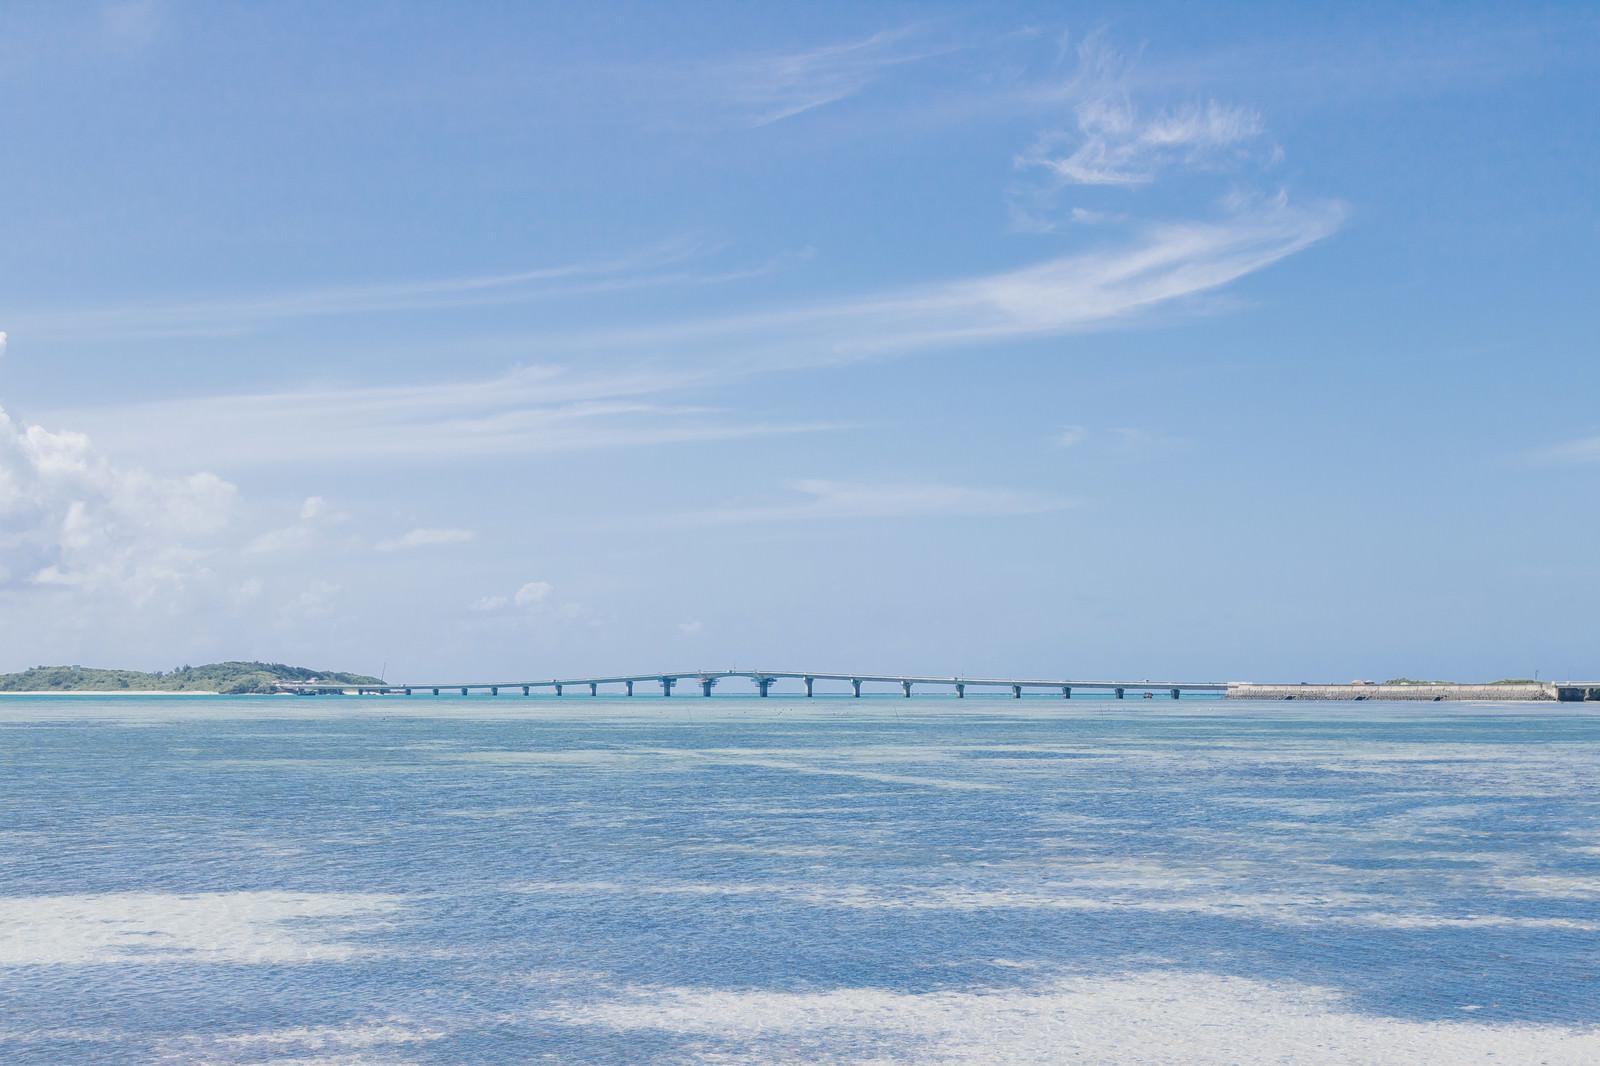 「池間大橋(宮古島)池間大橋(宮古島)」のフリー写真素材を拡大